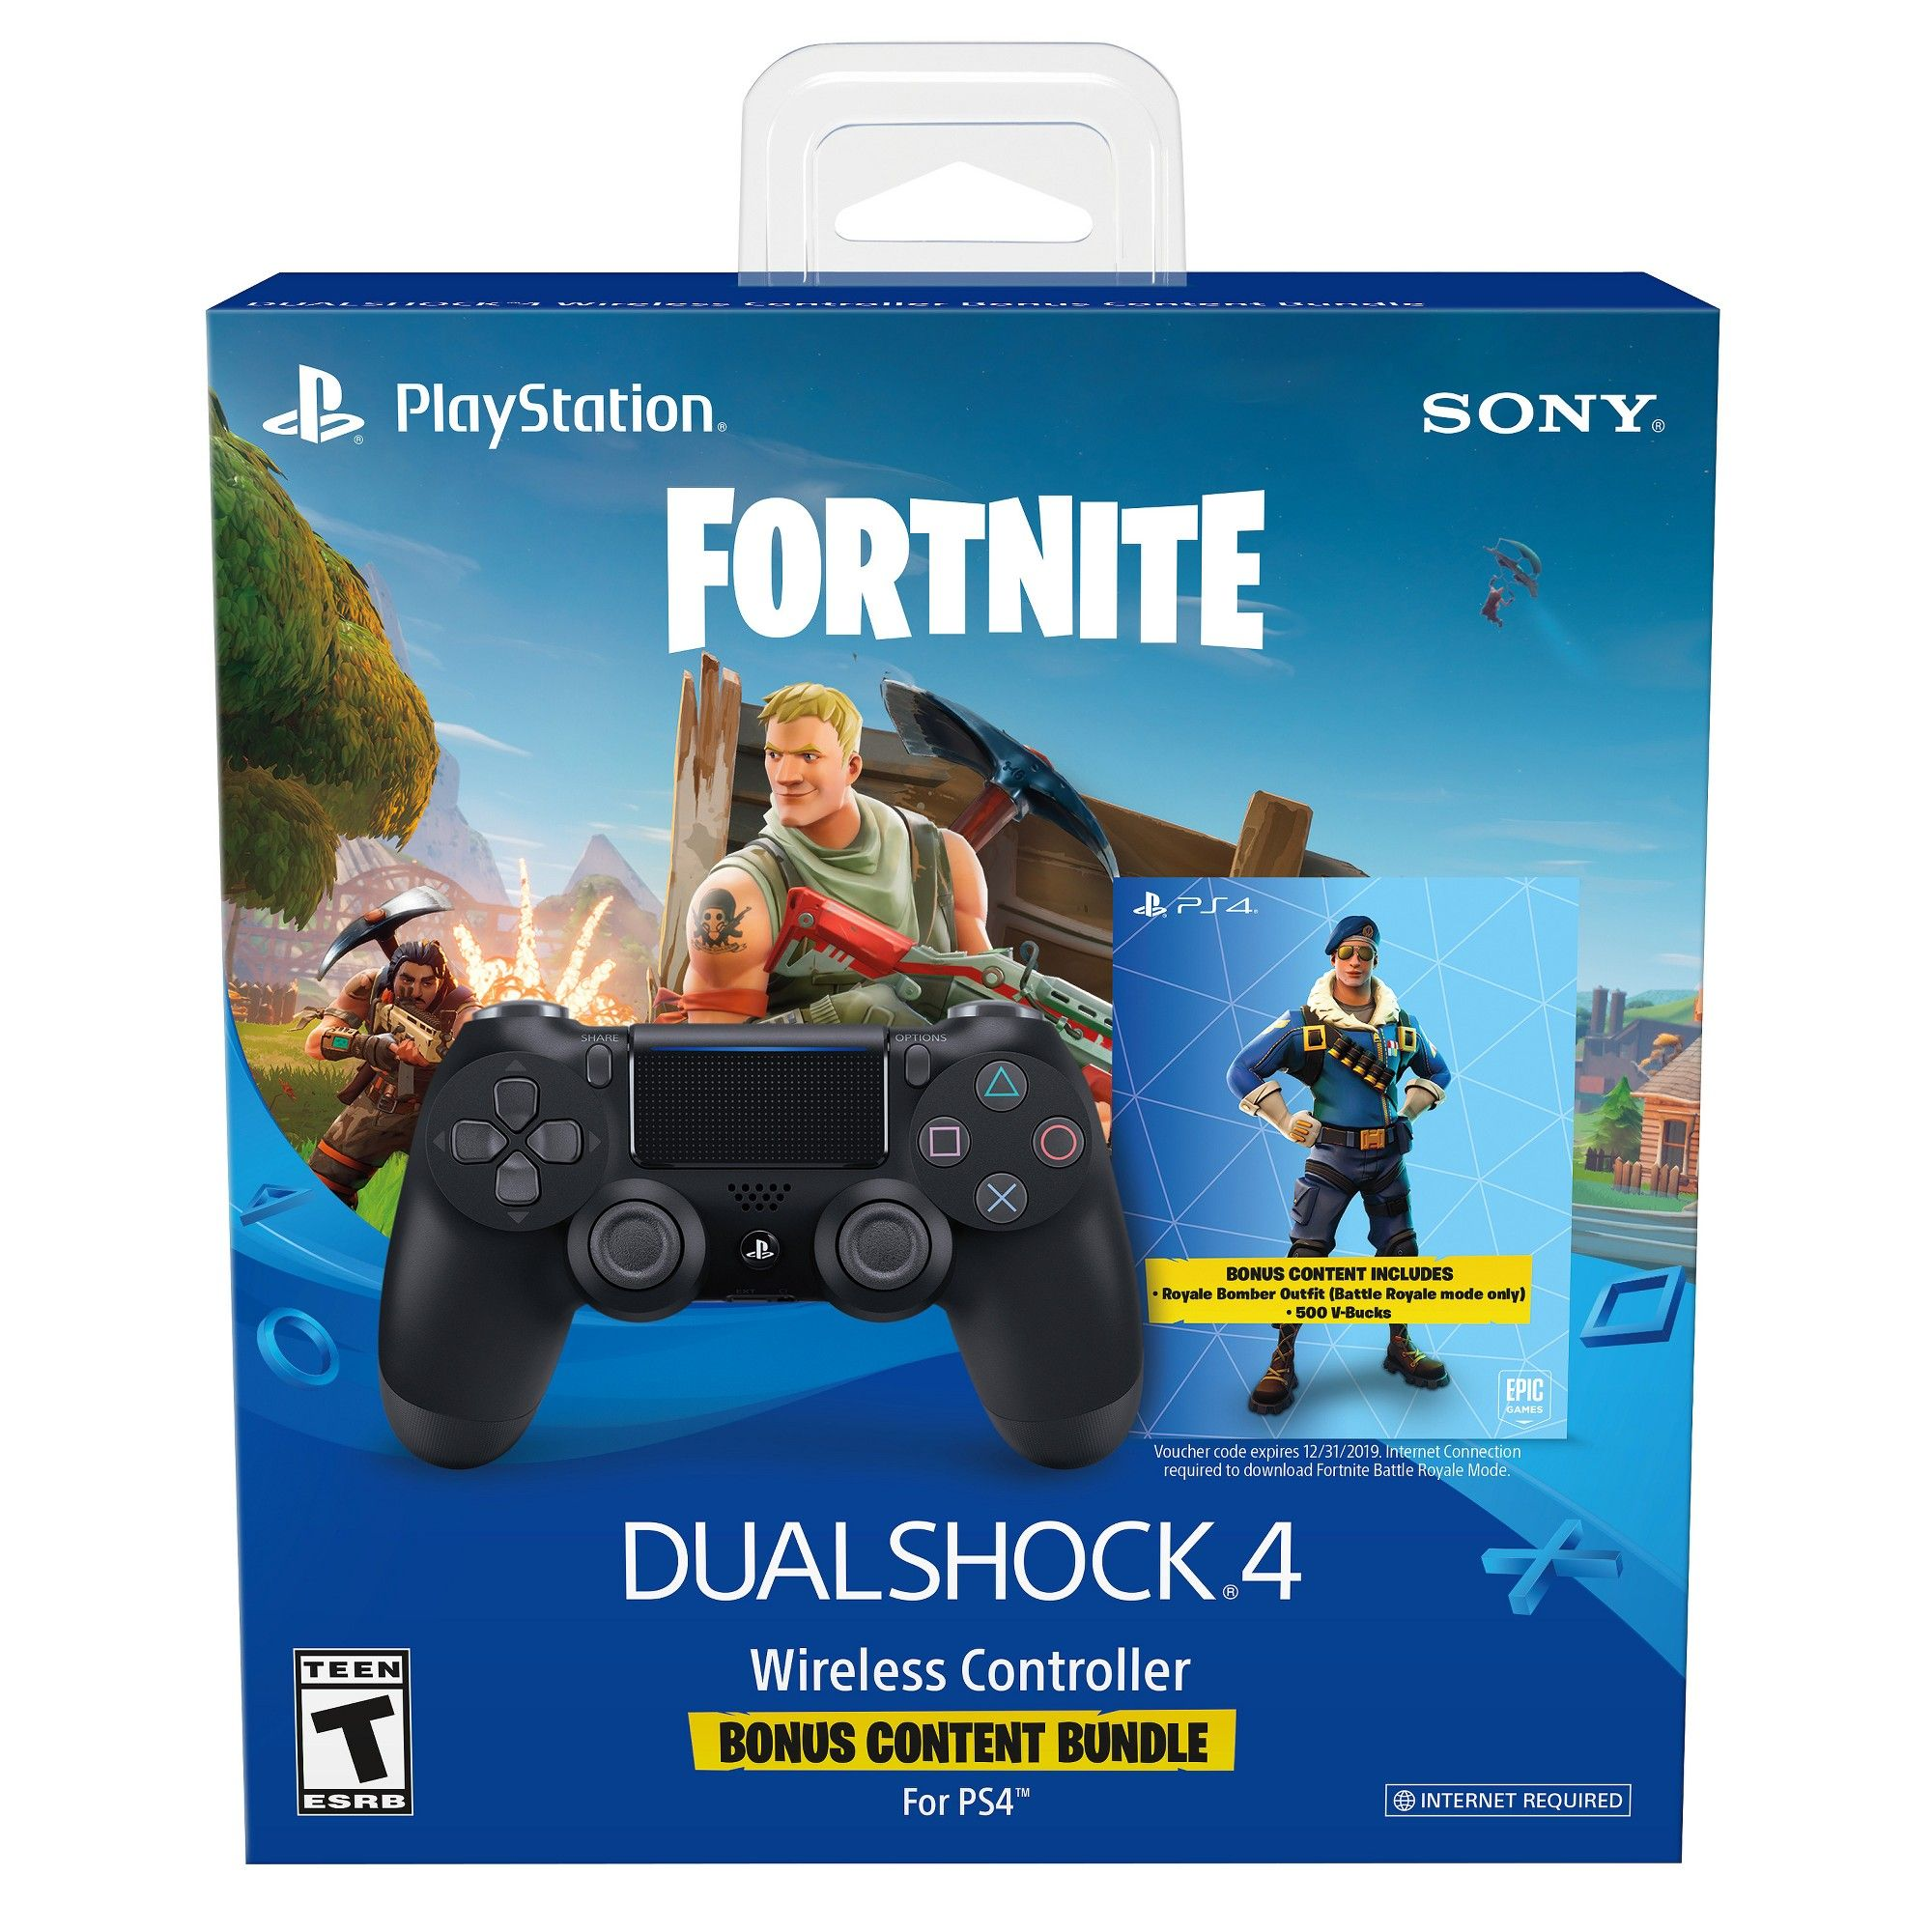 Dualshock 4 Fortnite Bonus Bundle Wireless Controller Playstation 4